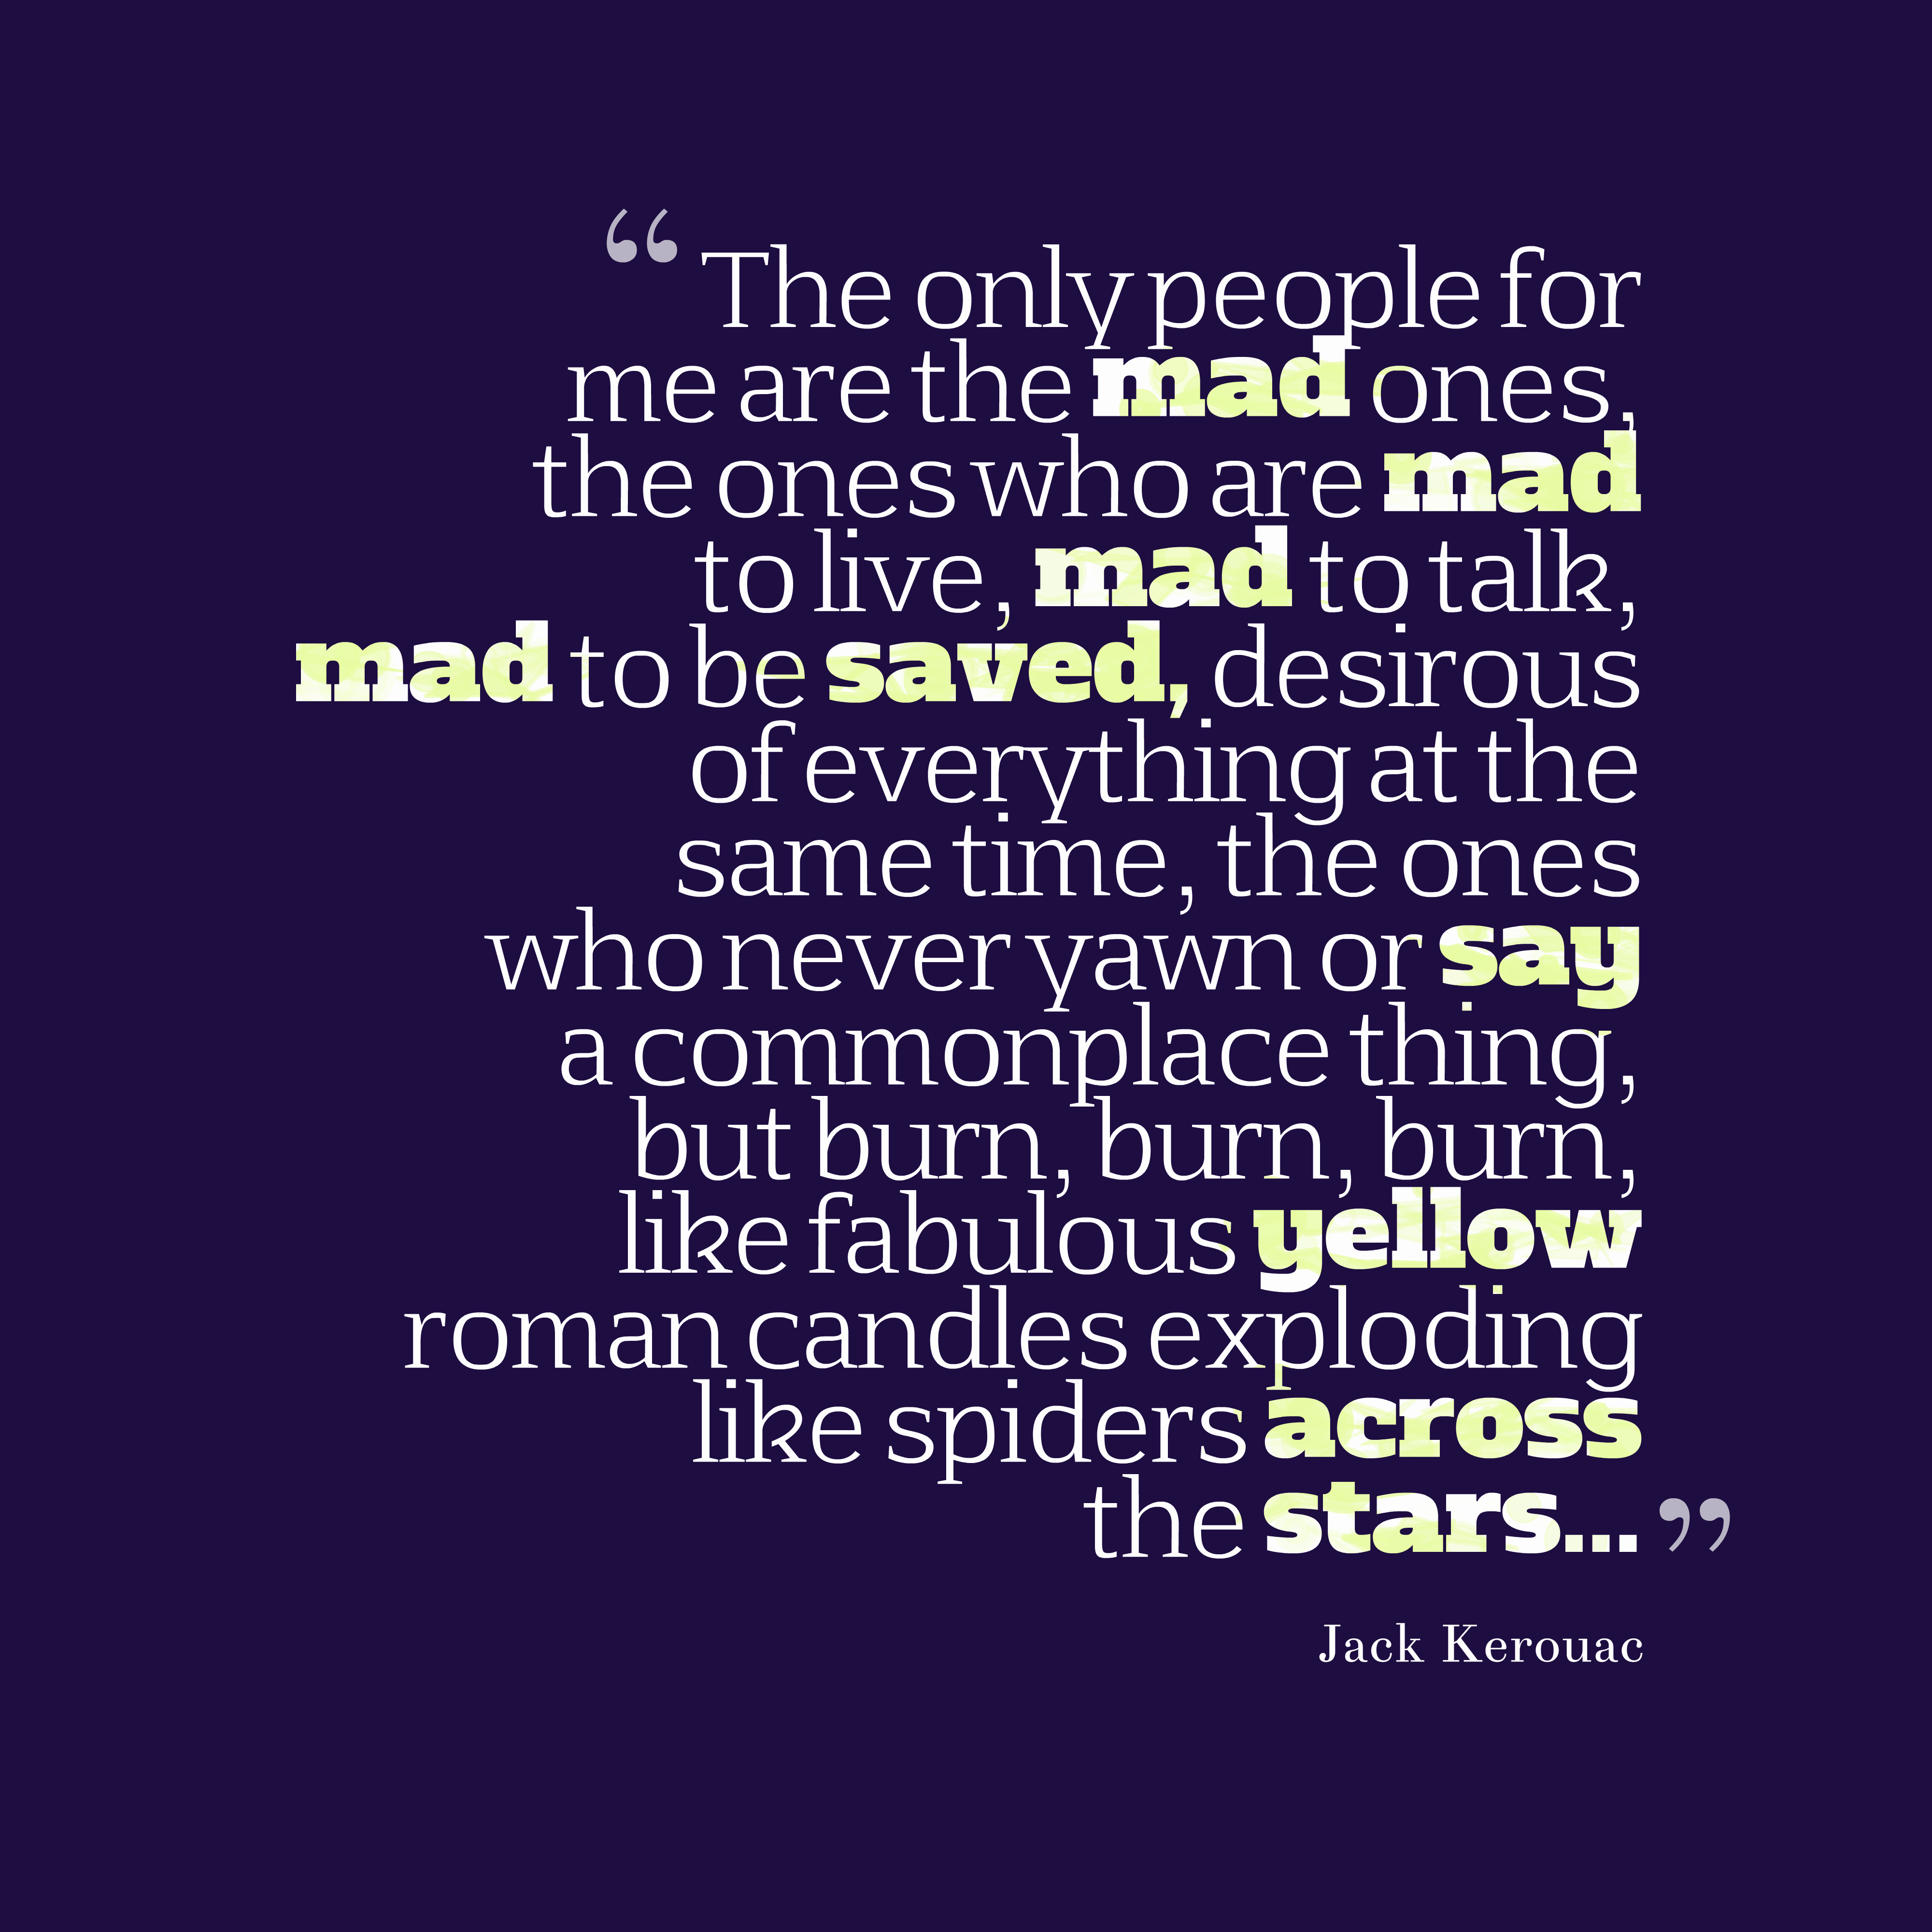 Jack Kerouac Quote About Passion